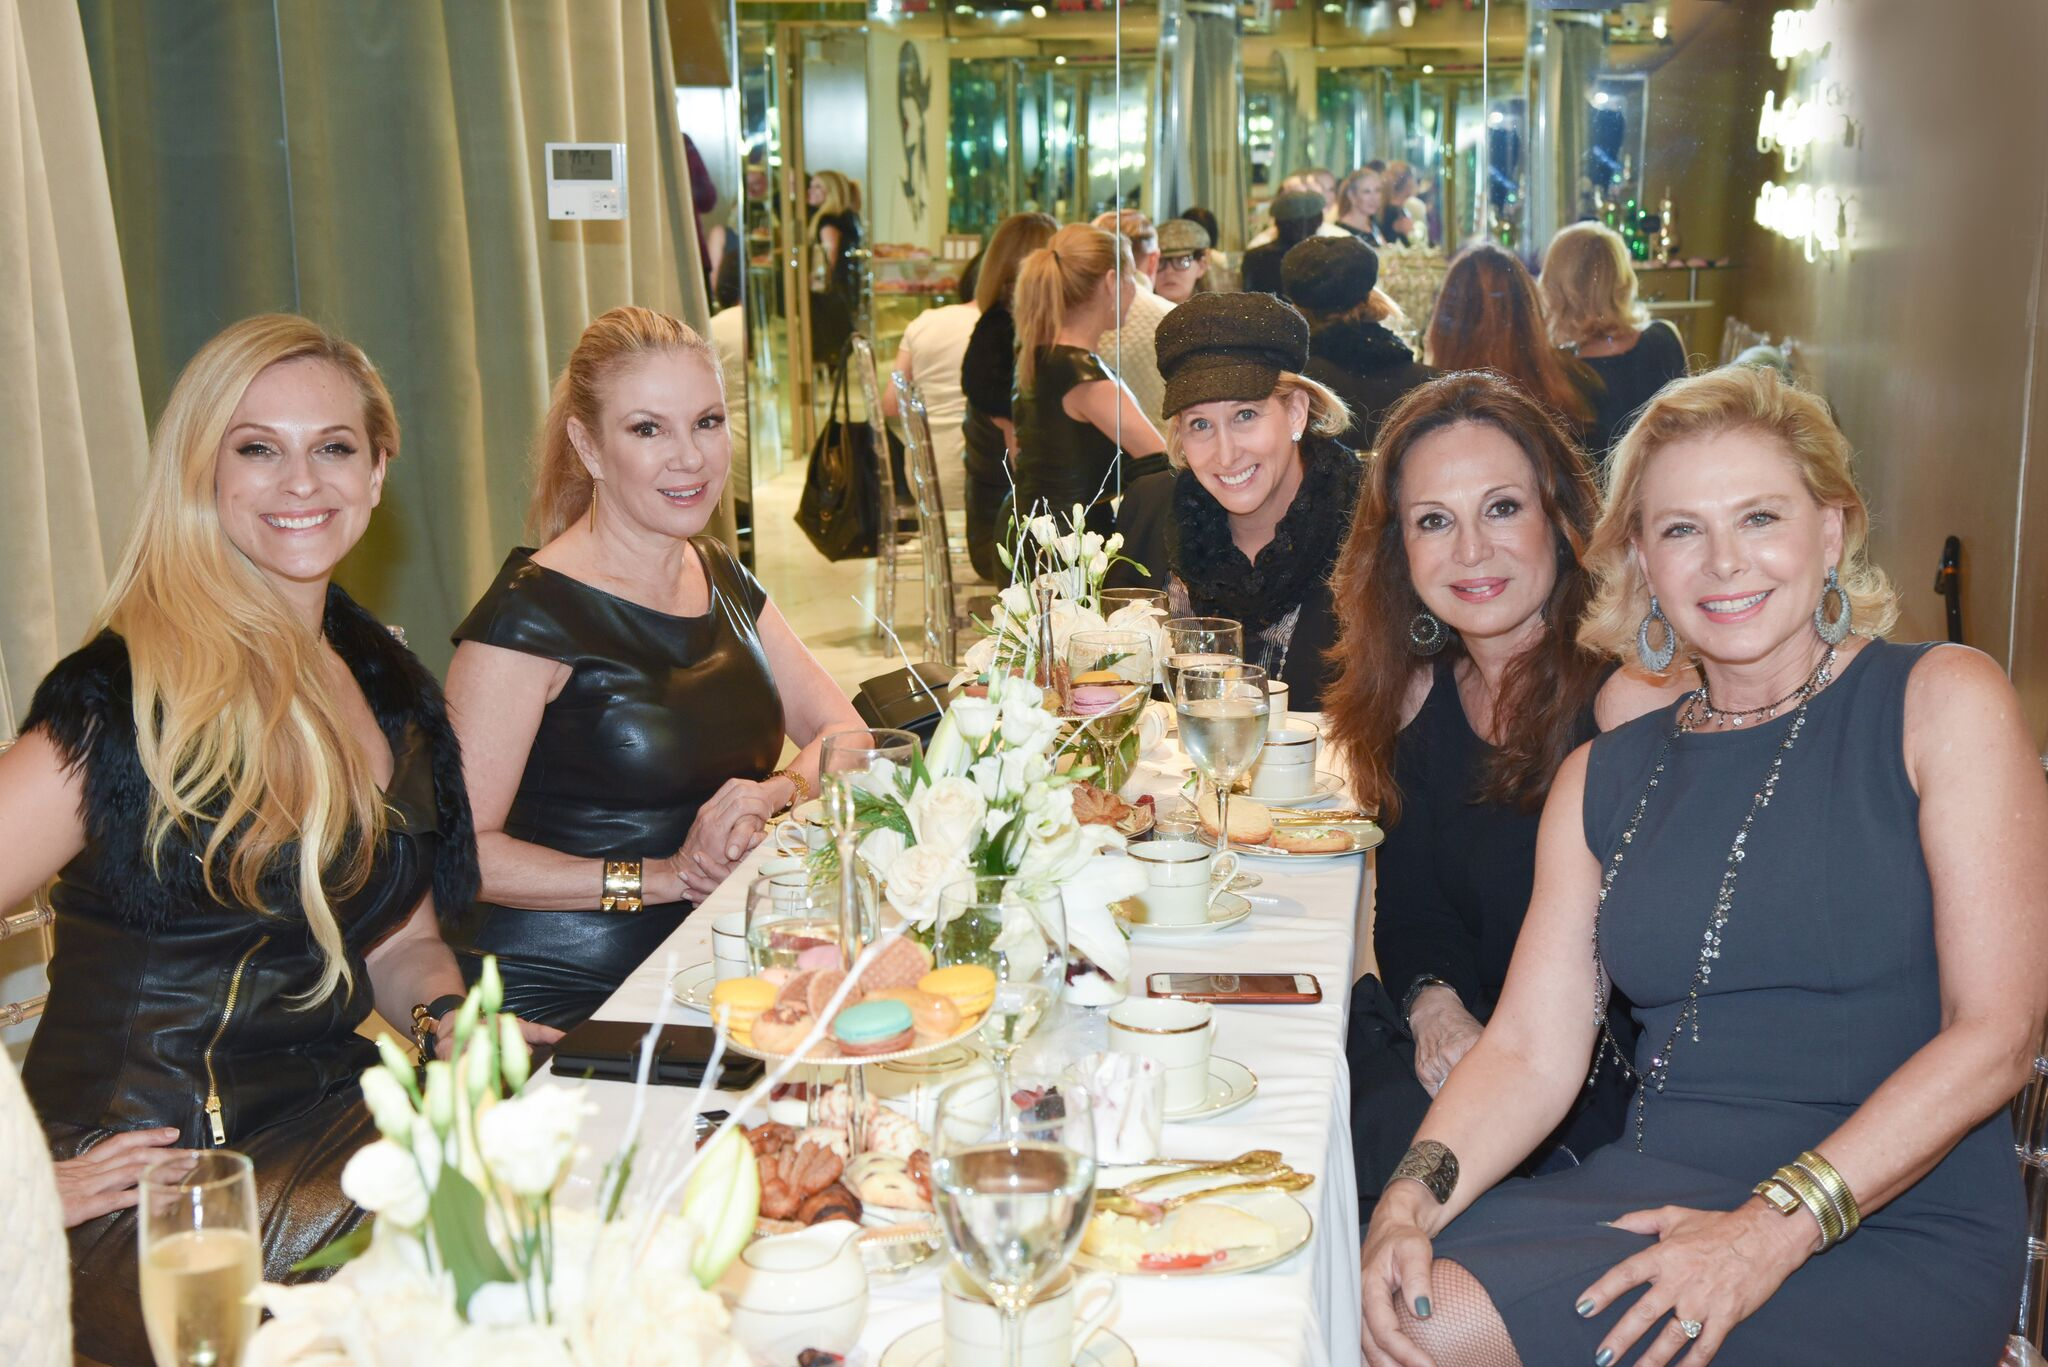 Jitrois Flagship Madison Avenue, New York City with Ramona Singer, Consuelo Vanderbilt Costin, Pamela Morgan